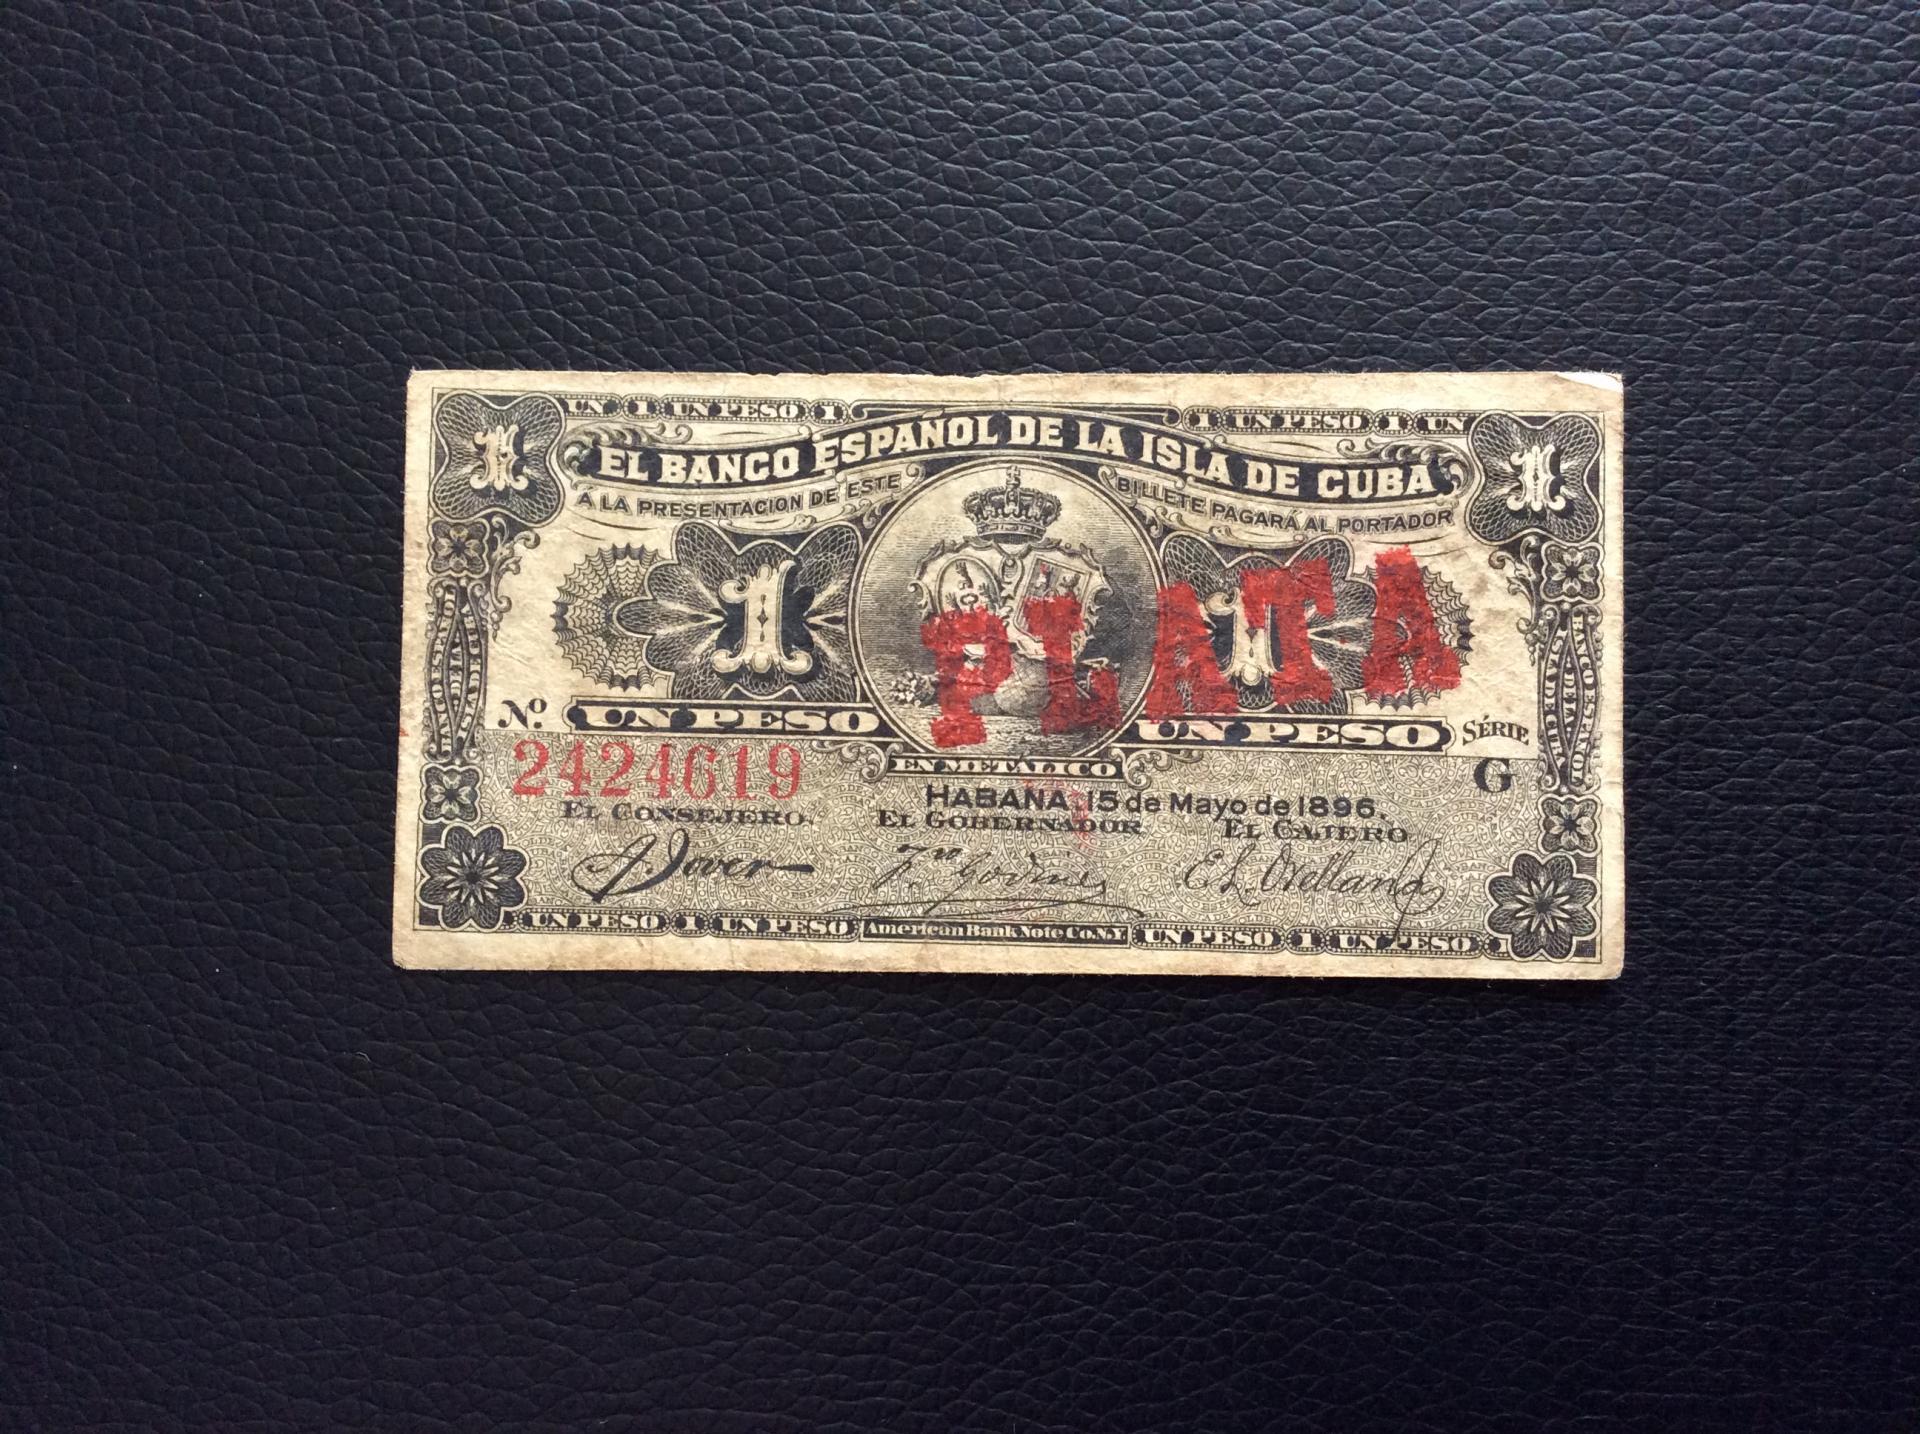 1 PESO 1896 - ISLA DE CUBA - COLONIAS DE ULTRAMAR - RESELLO PLATA